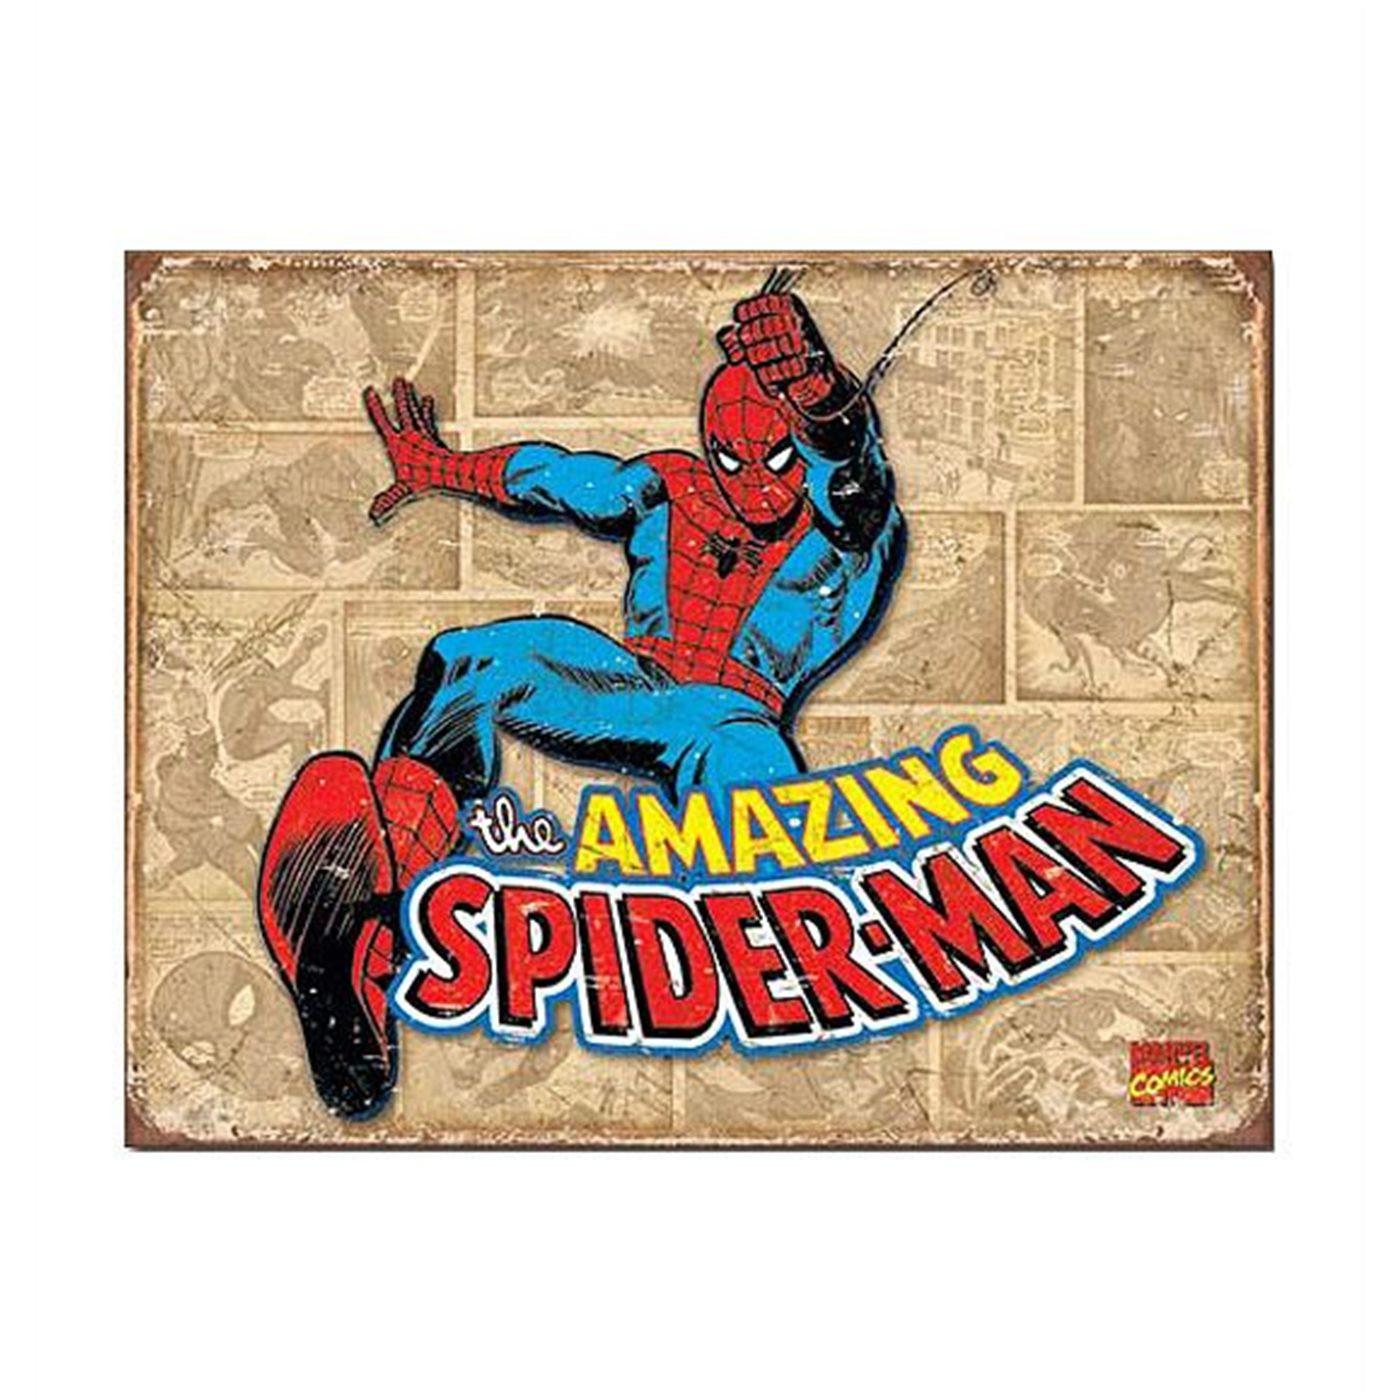 Spider-Man Vintage Sepia Panels Tin Sign